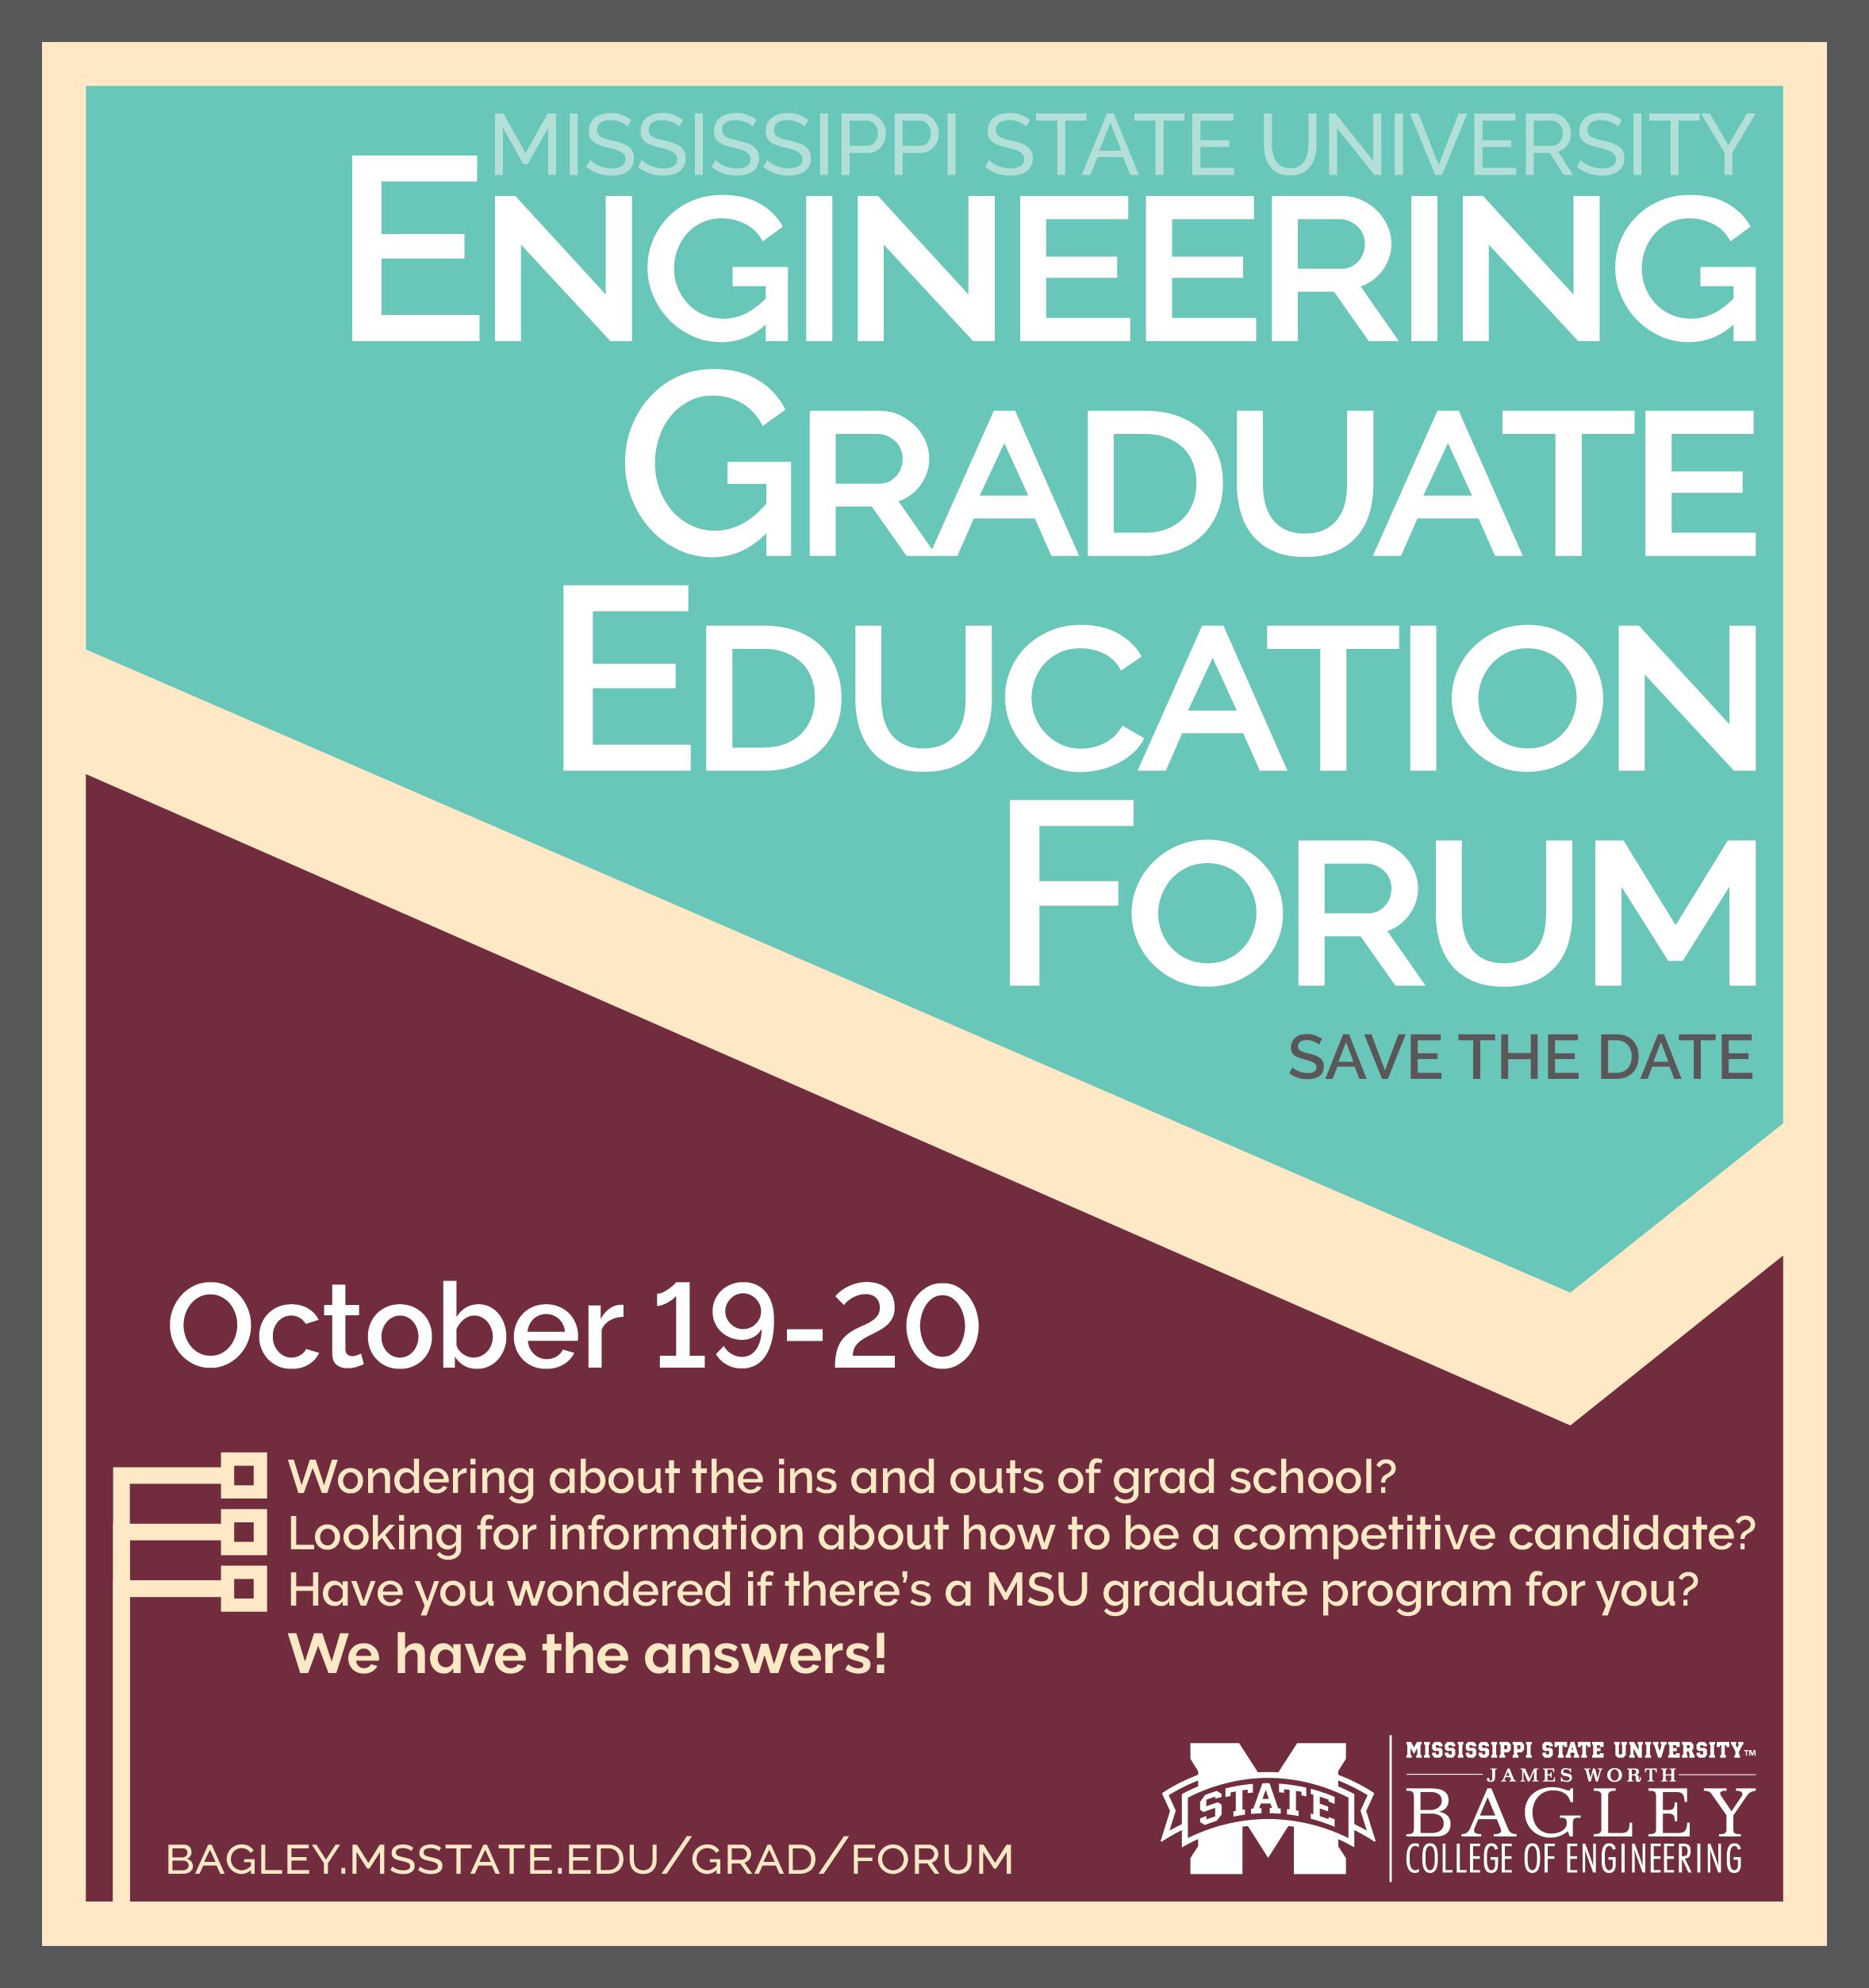 Engineering Graduate Education Forum Save the Date